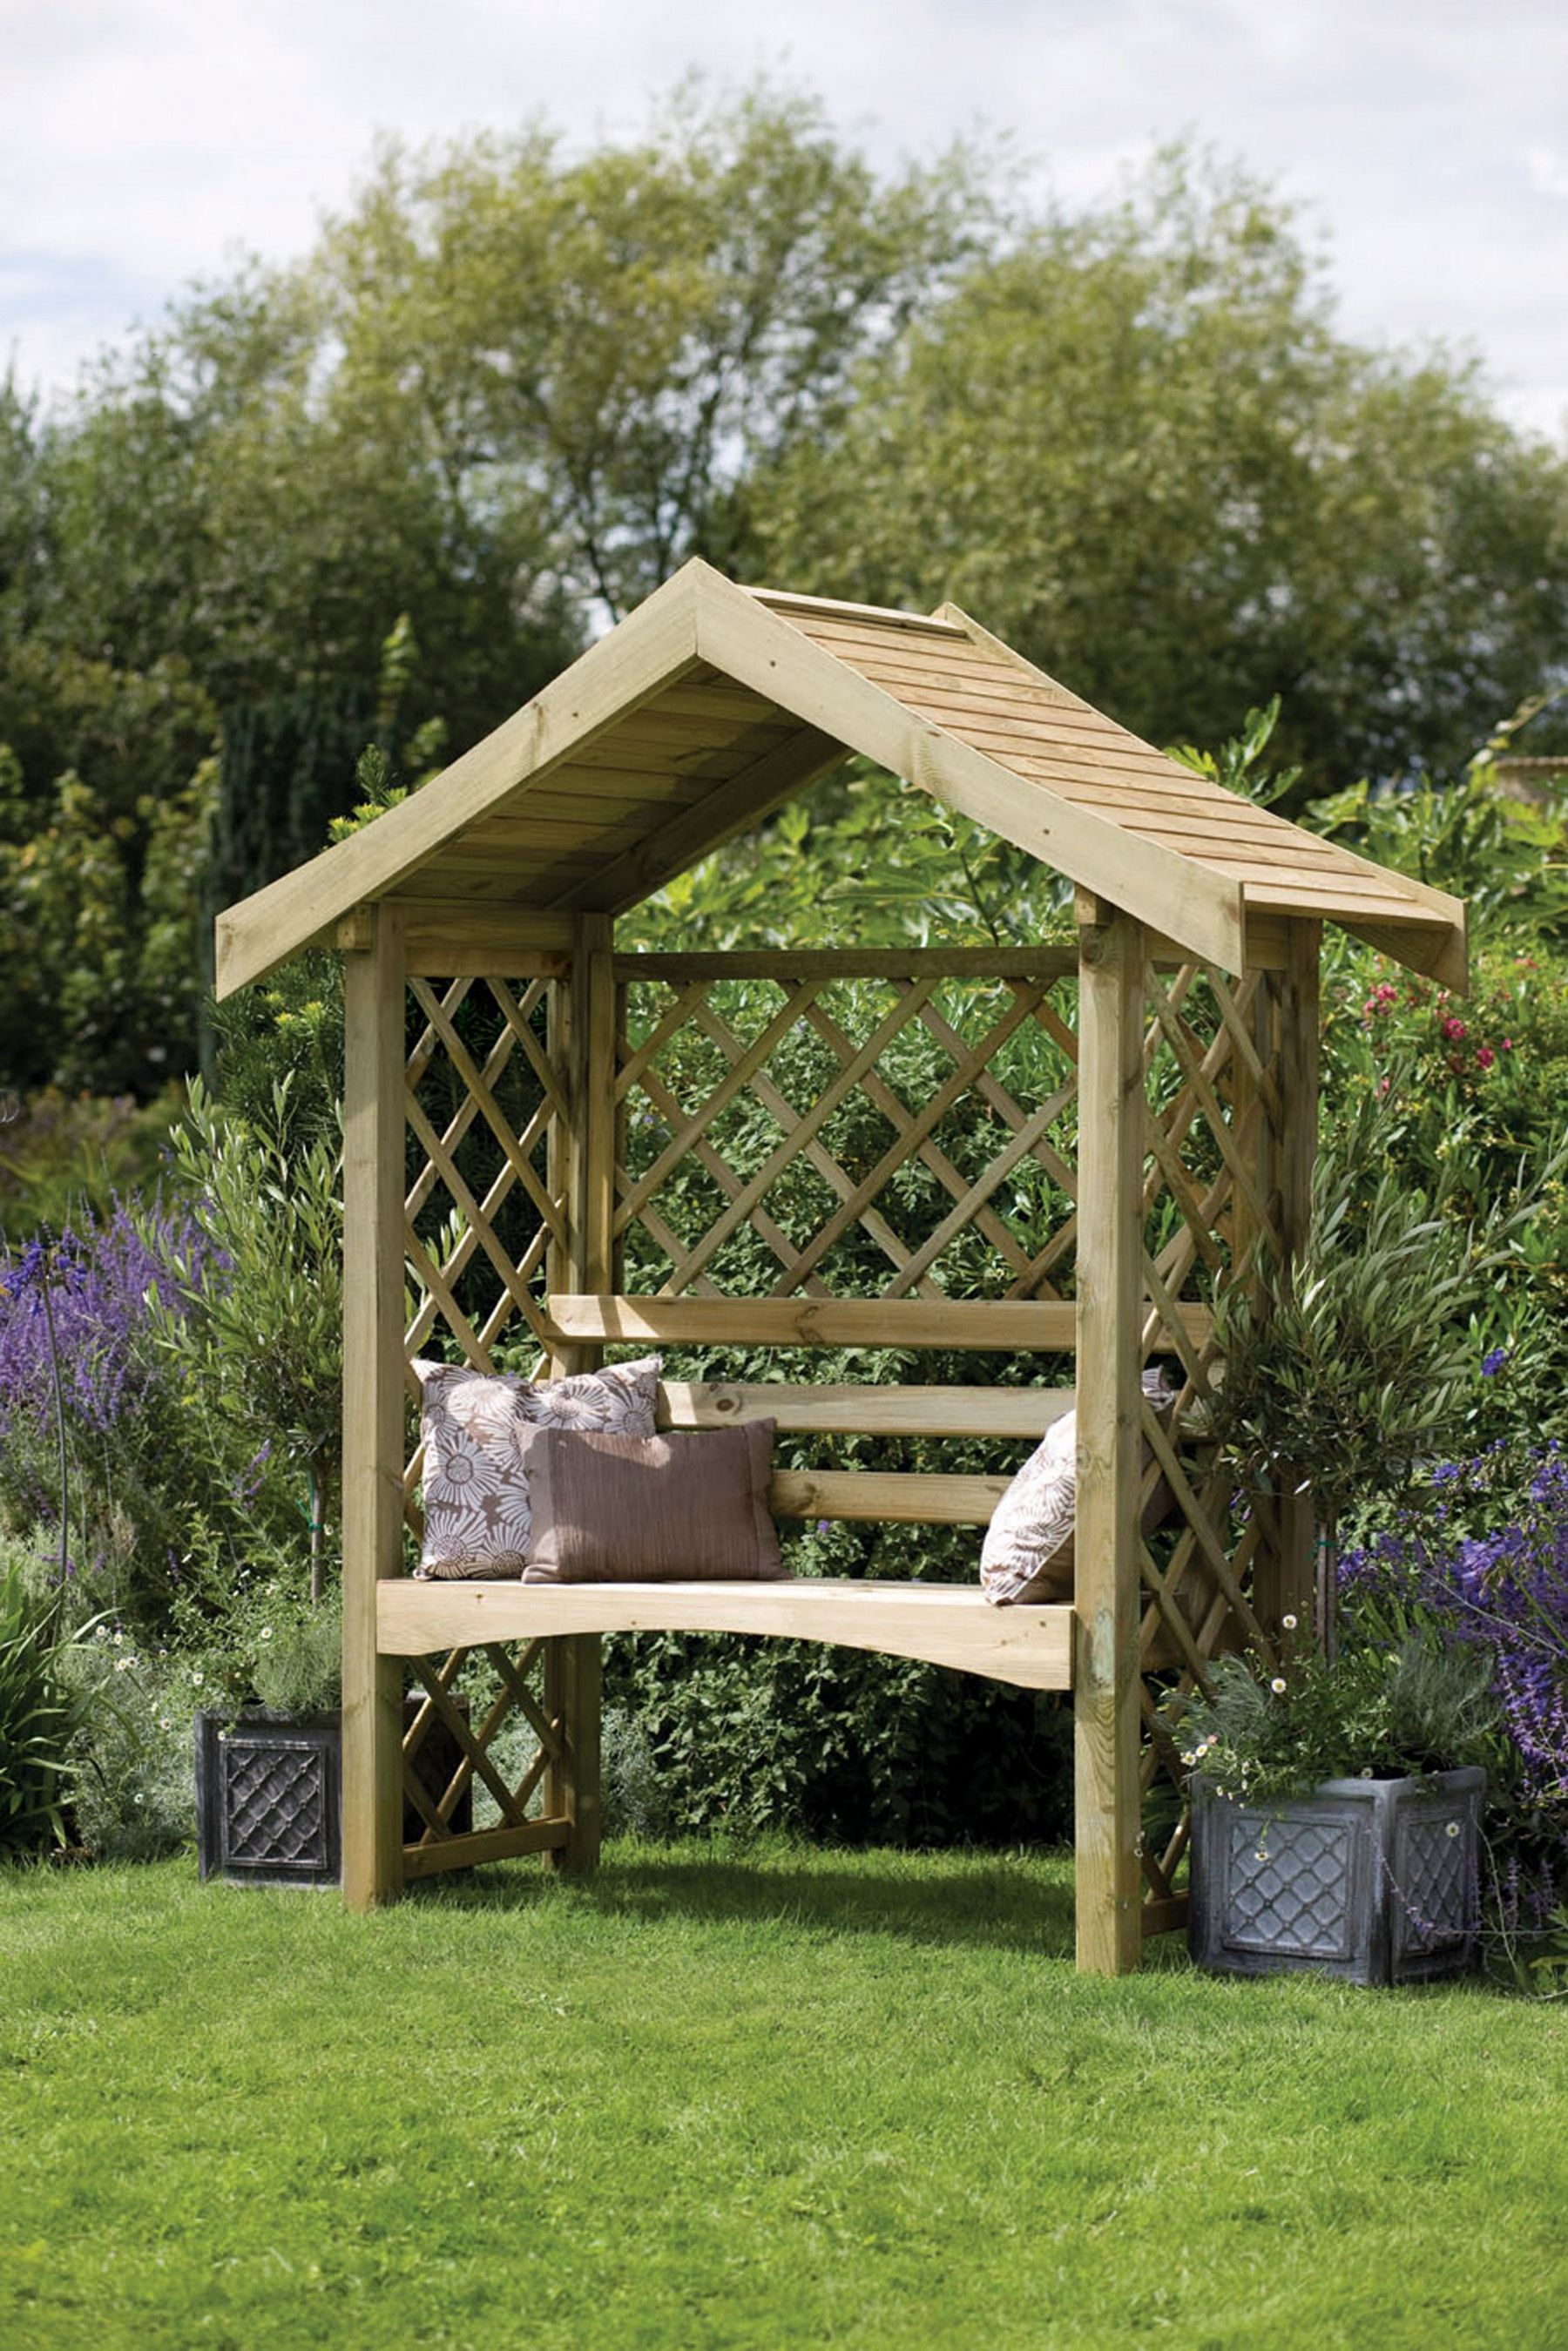 Pin By Terri Giversen On Someday Projects Garden Arbour Seat Garden Arbor Garden Structures